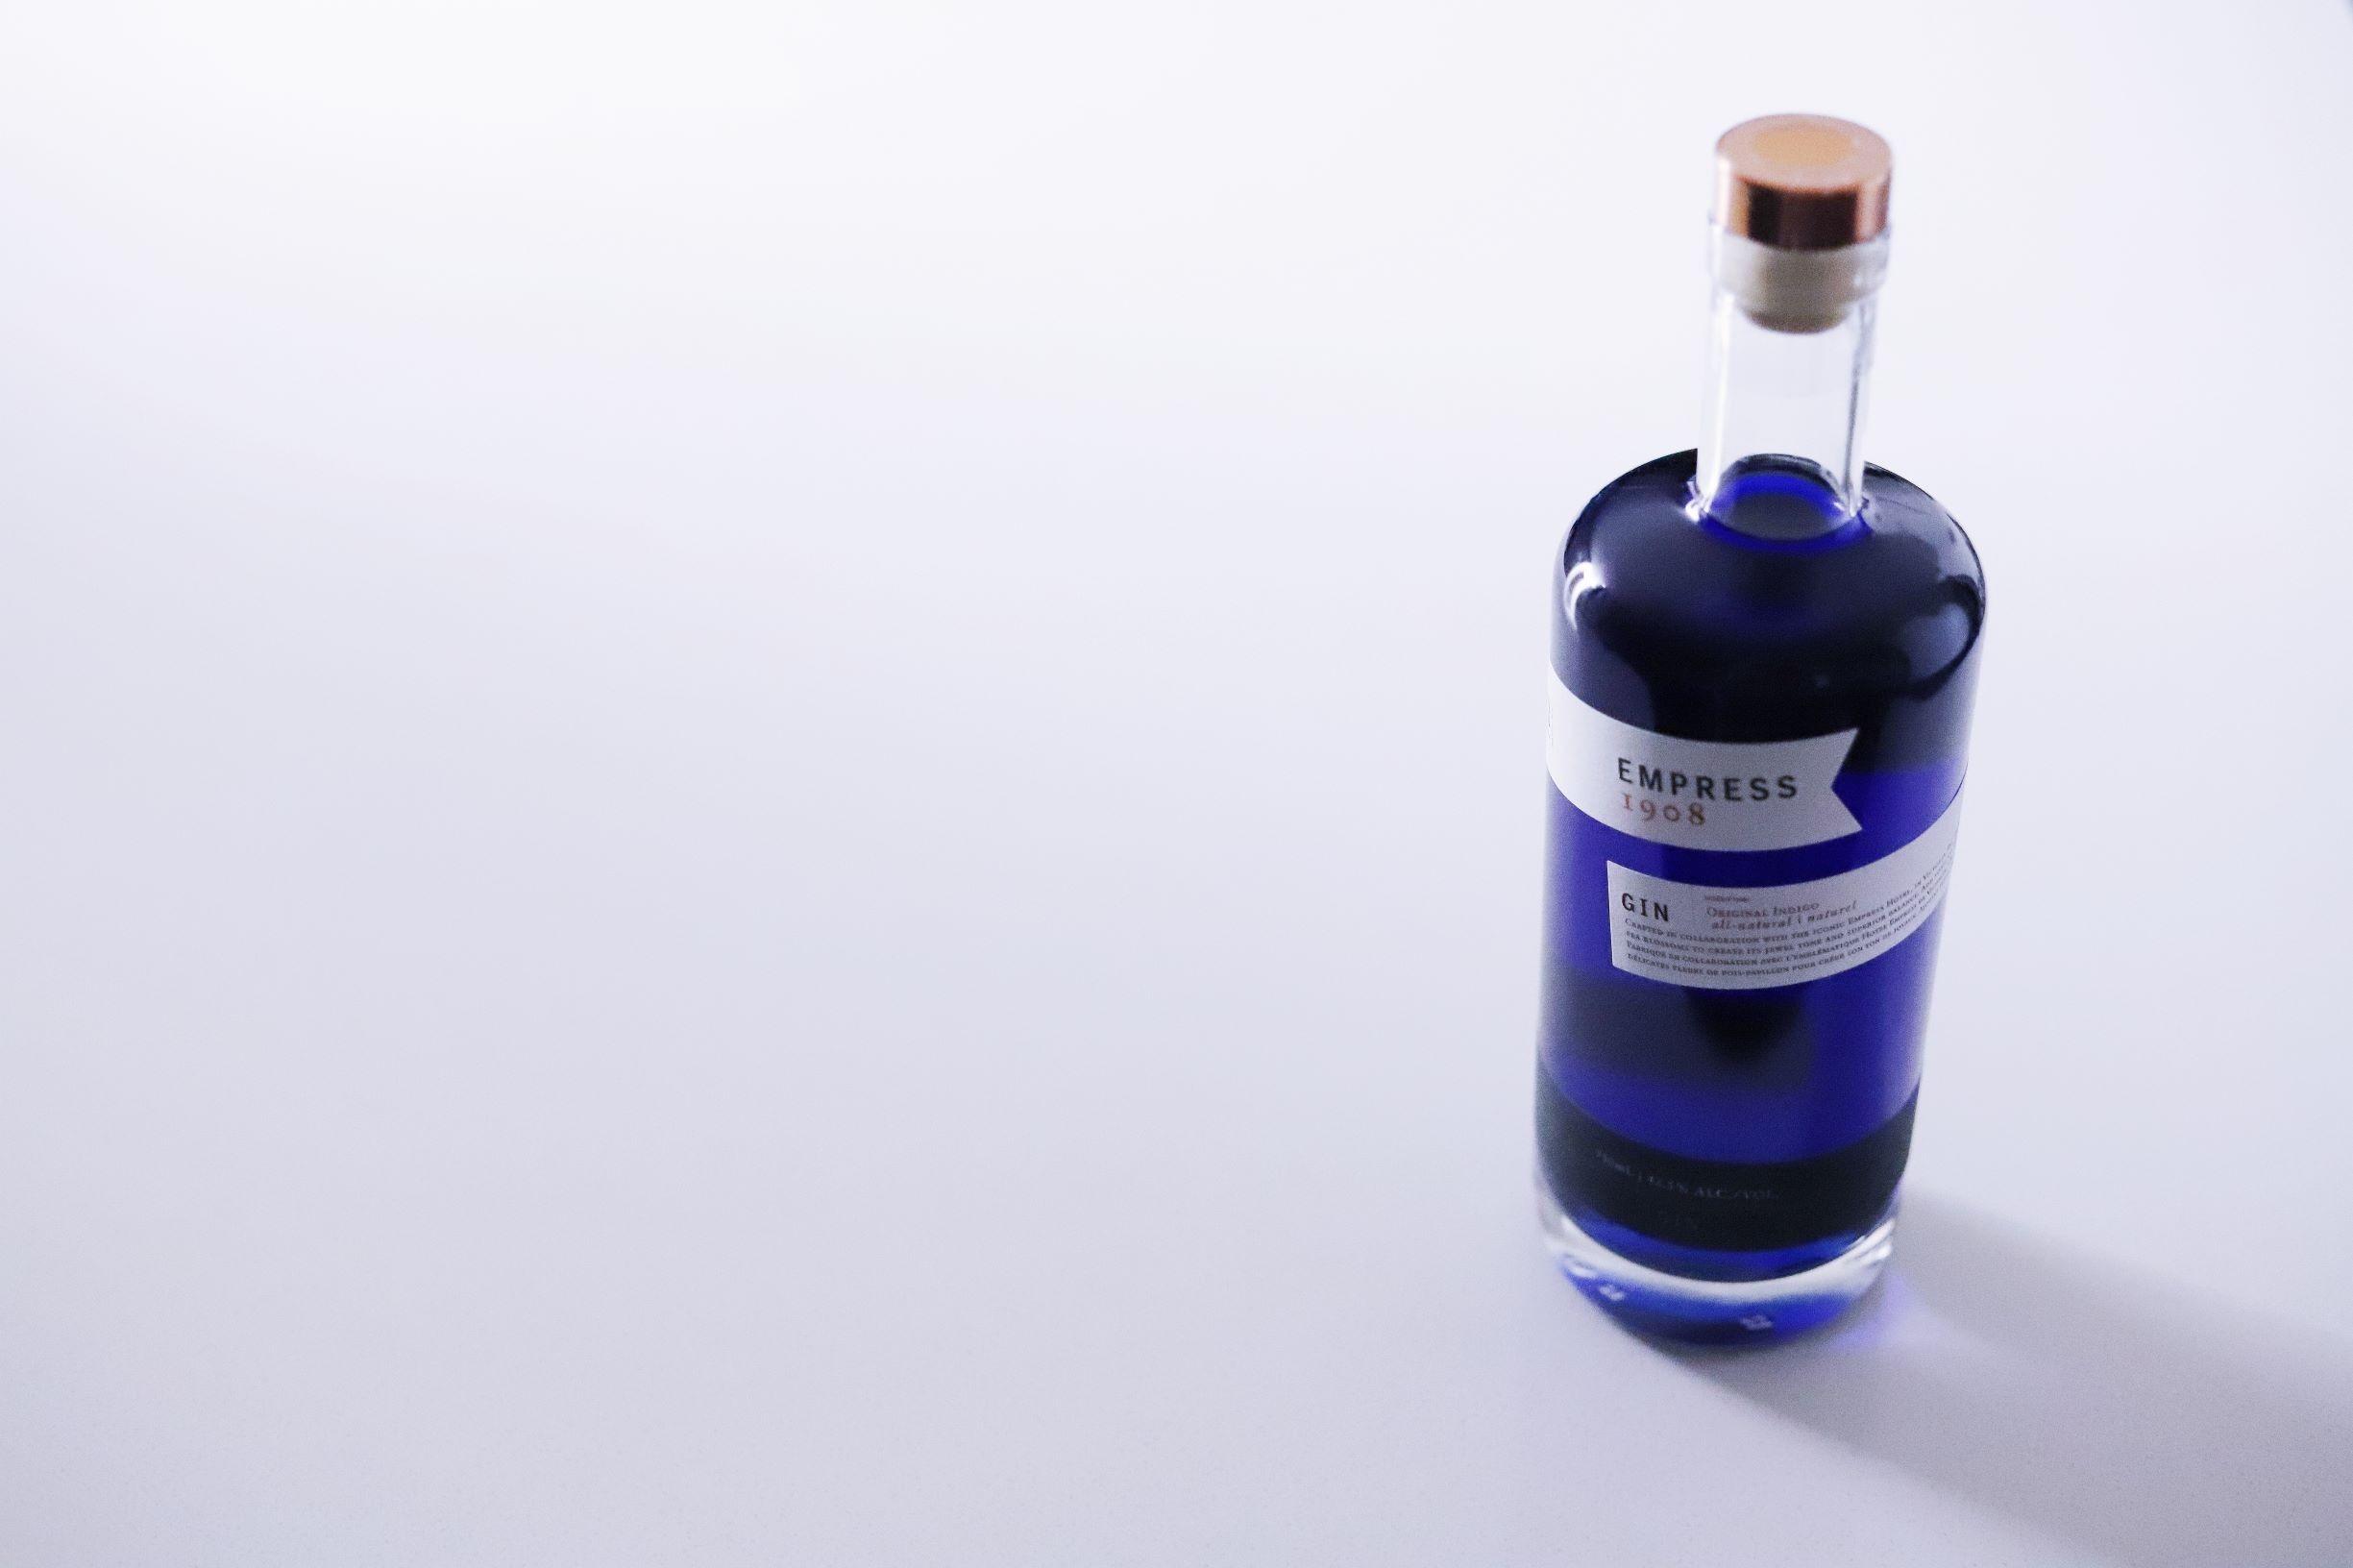 Victoria, BC based Empress Gin bottle for a cocktail using LeClair Organics Coffee Berry Tea, Cascara Tea